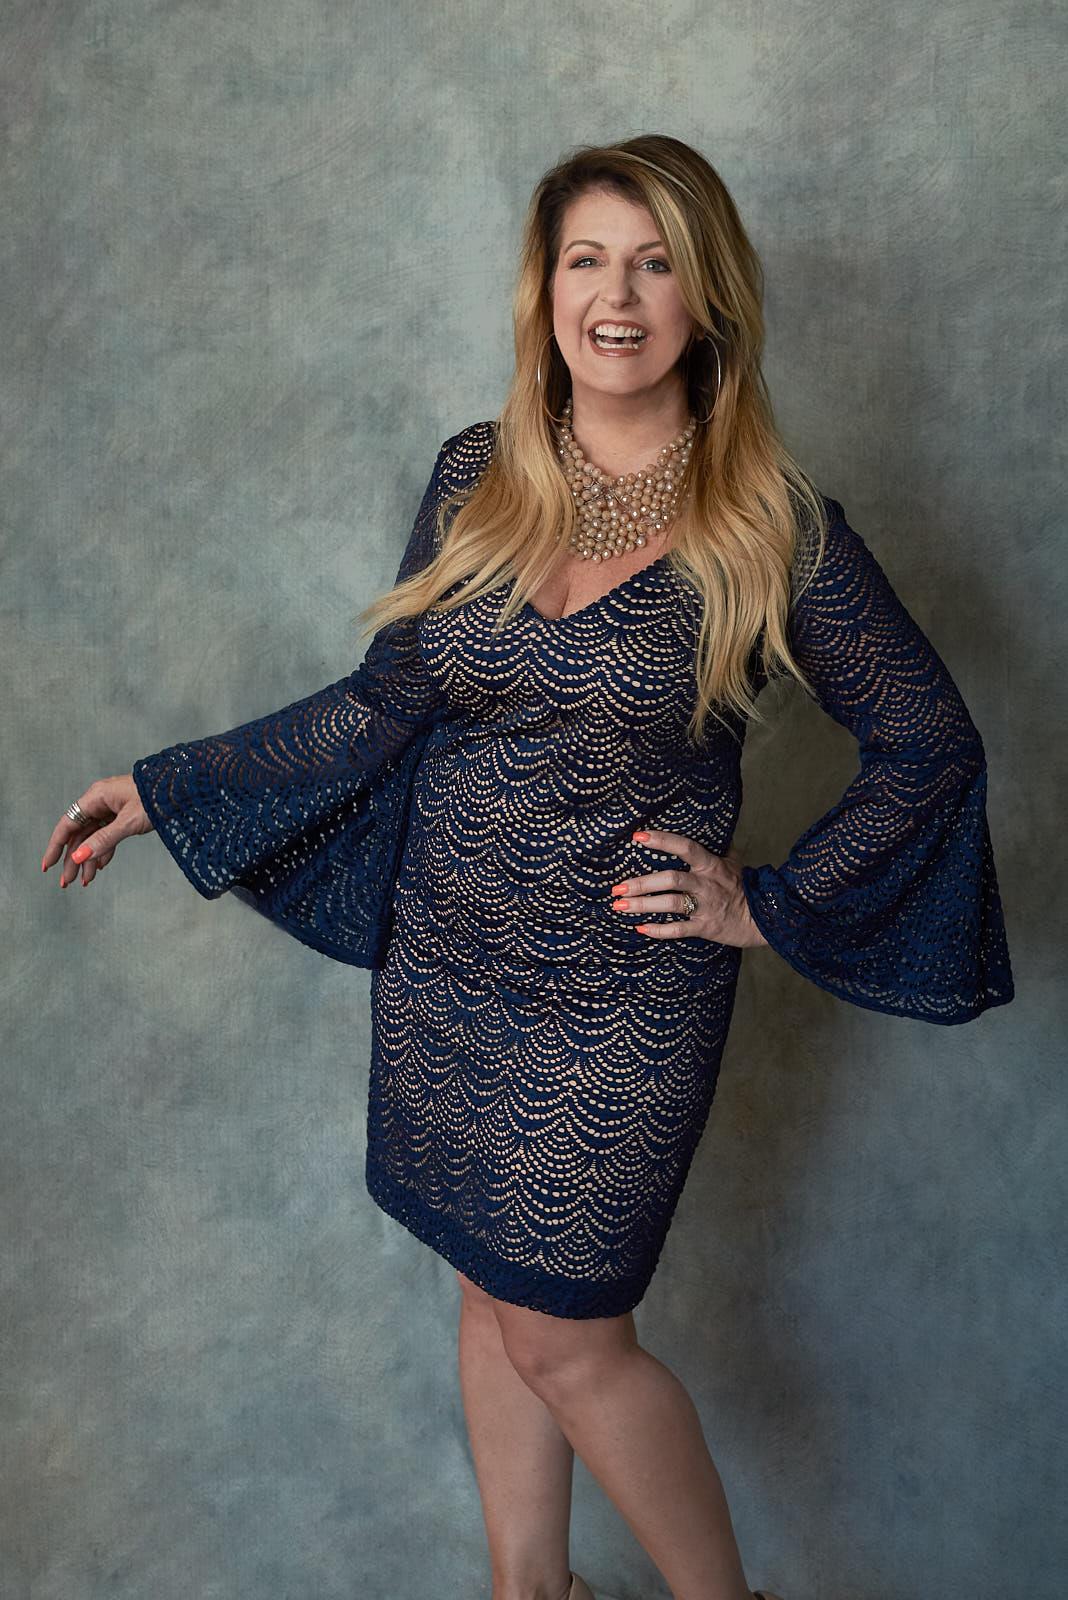 Alicia Amsler salon owner founder of non profit